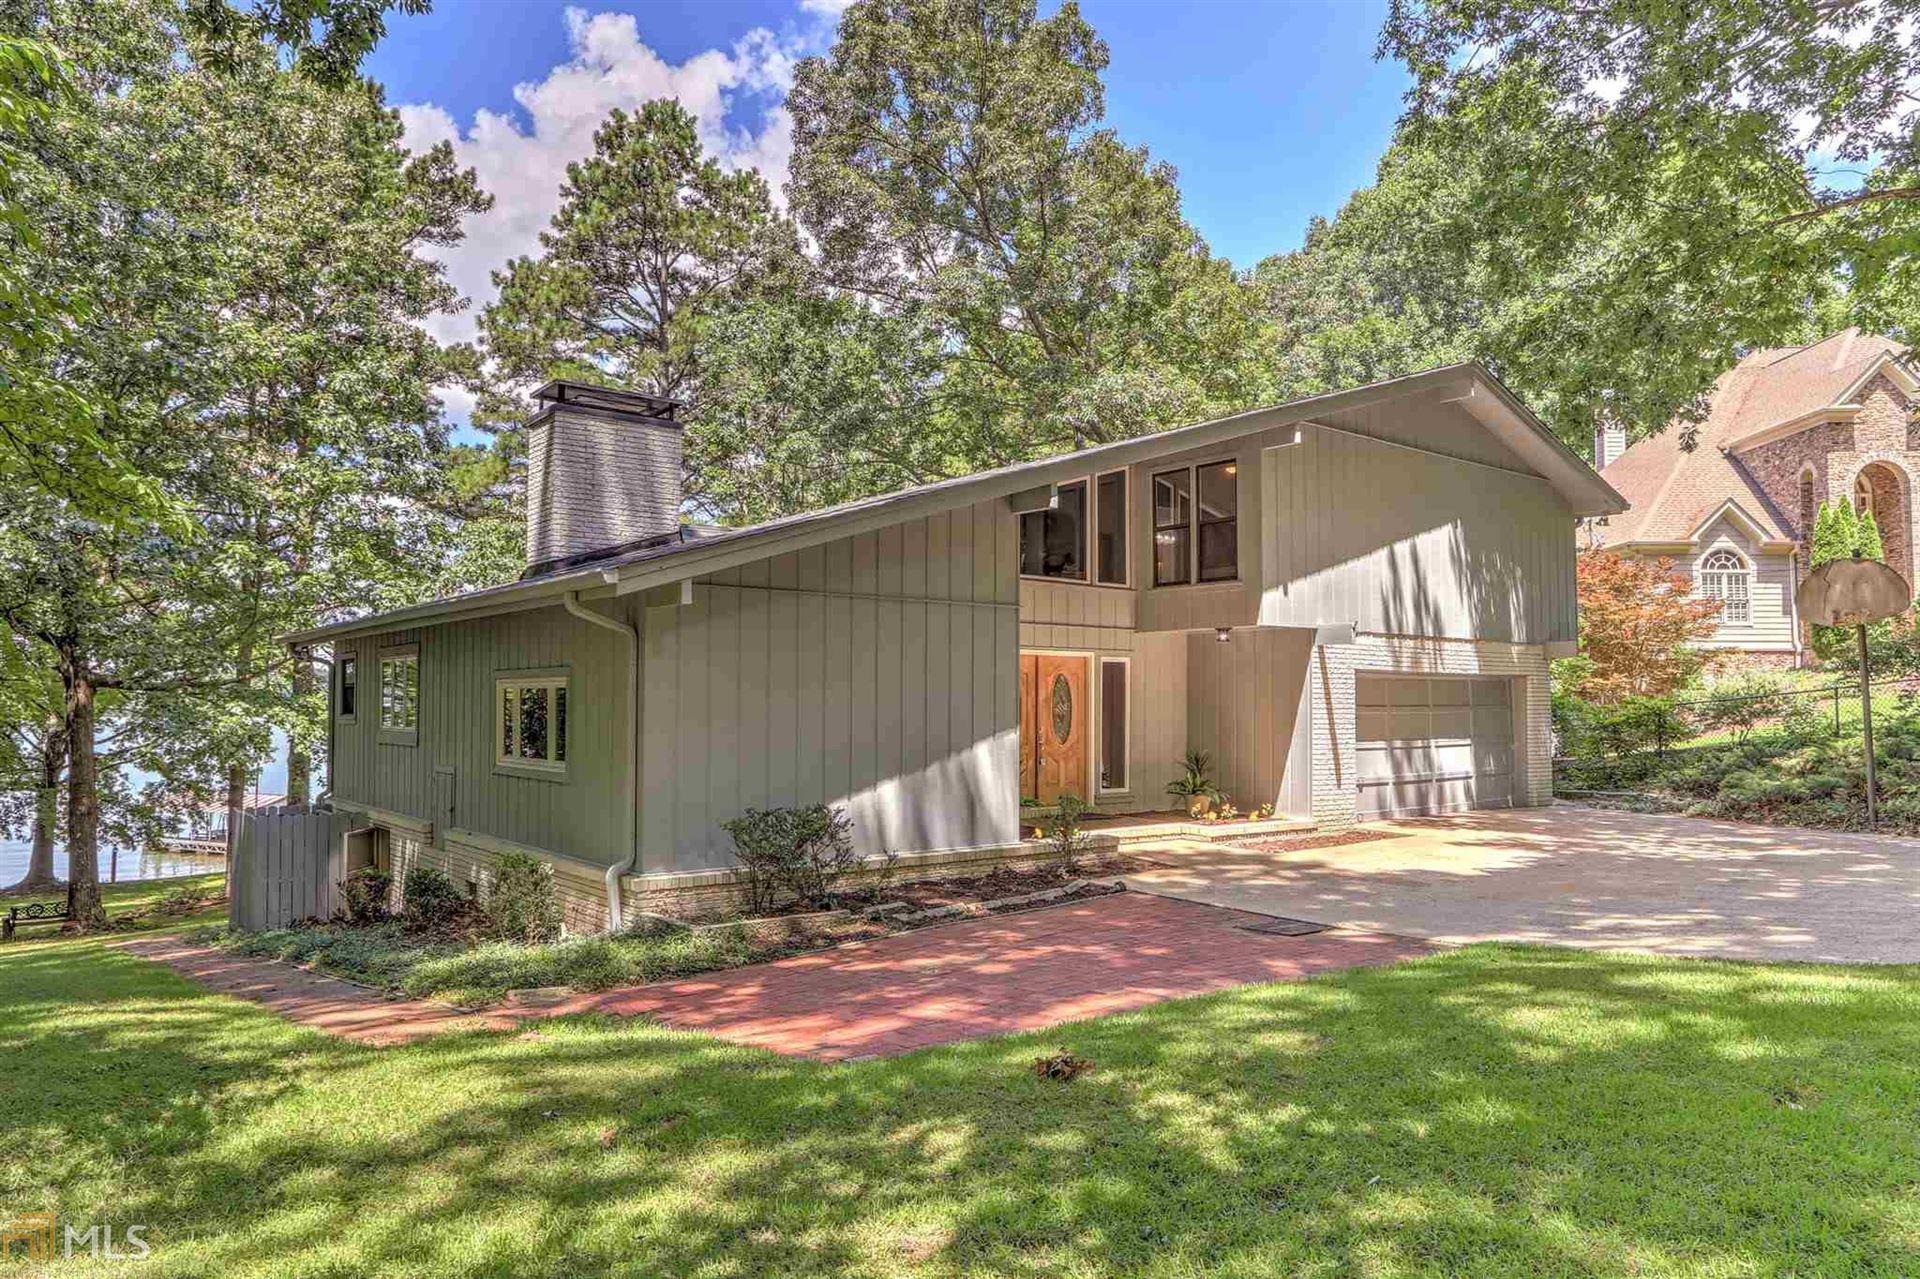 3183 Lake Ranch Dr, Gainesville, GA 30506 - MLS#: 8815625